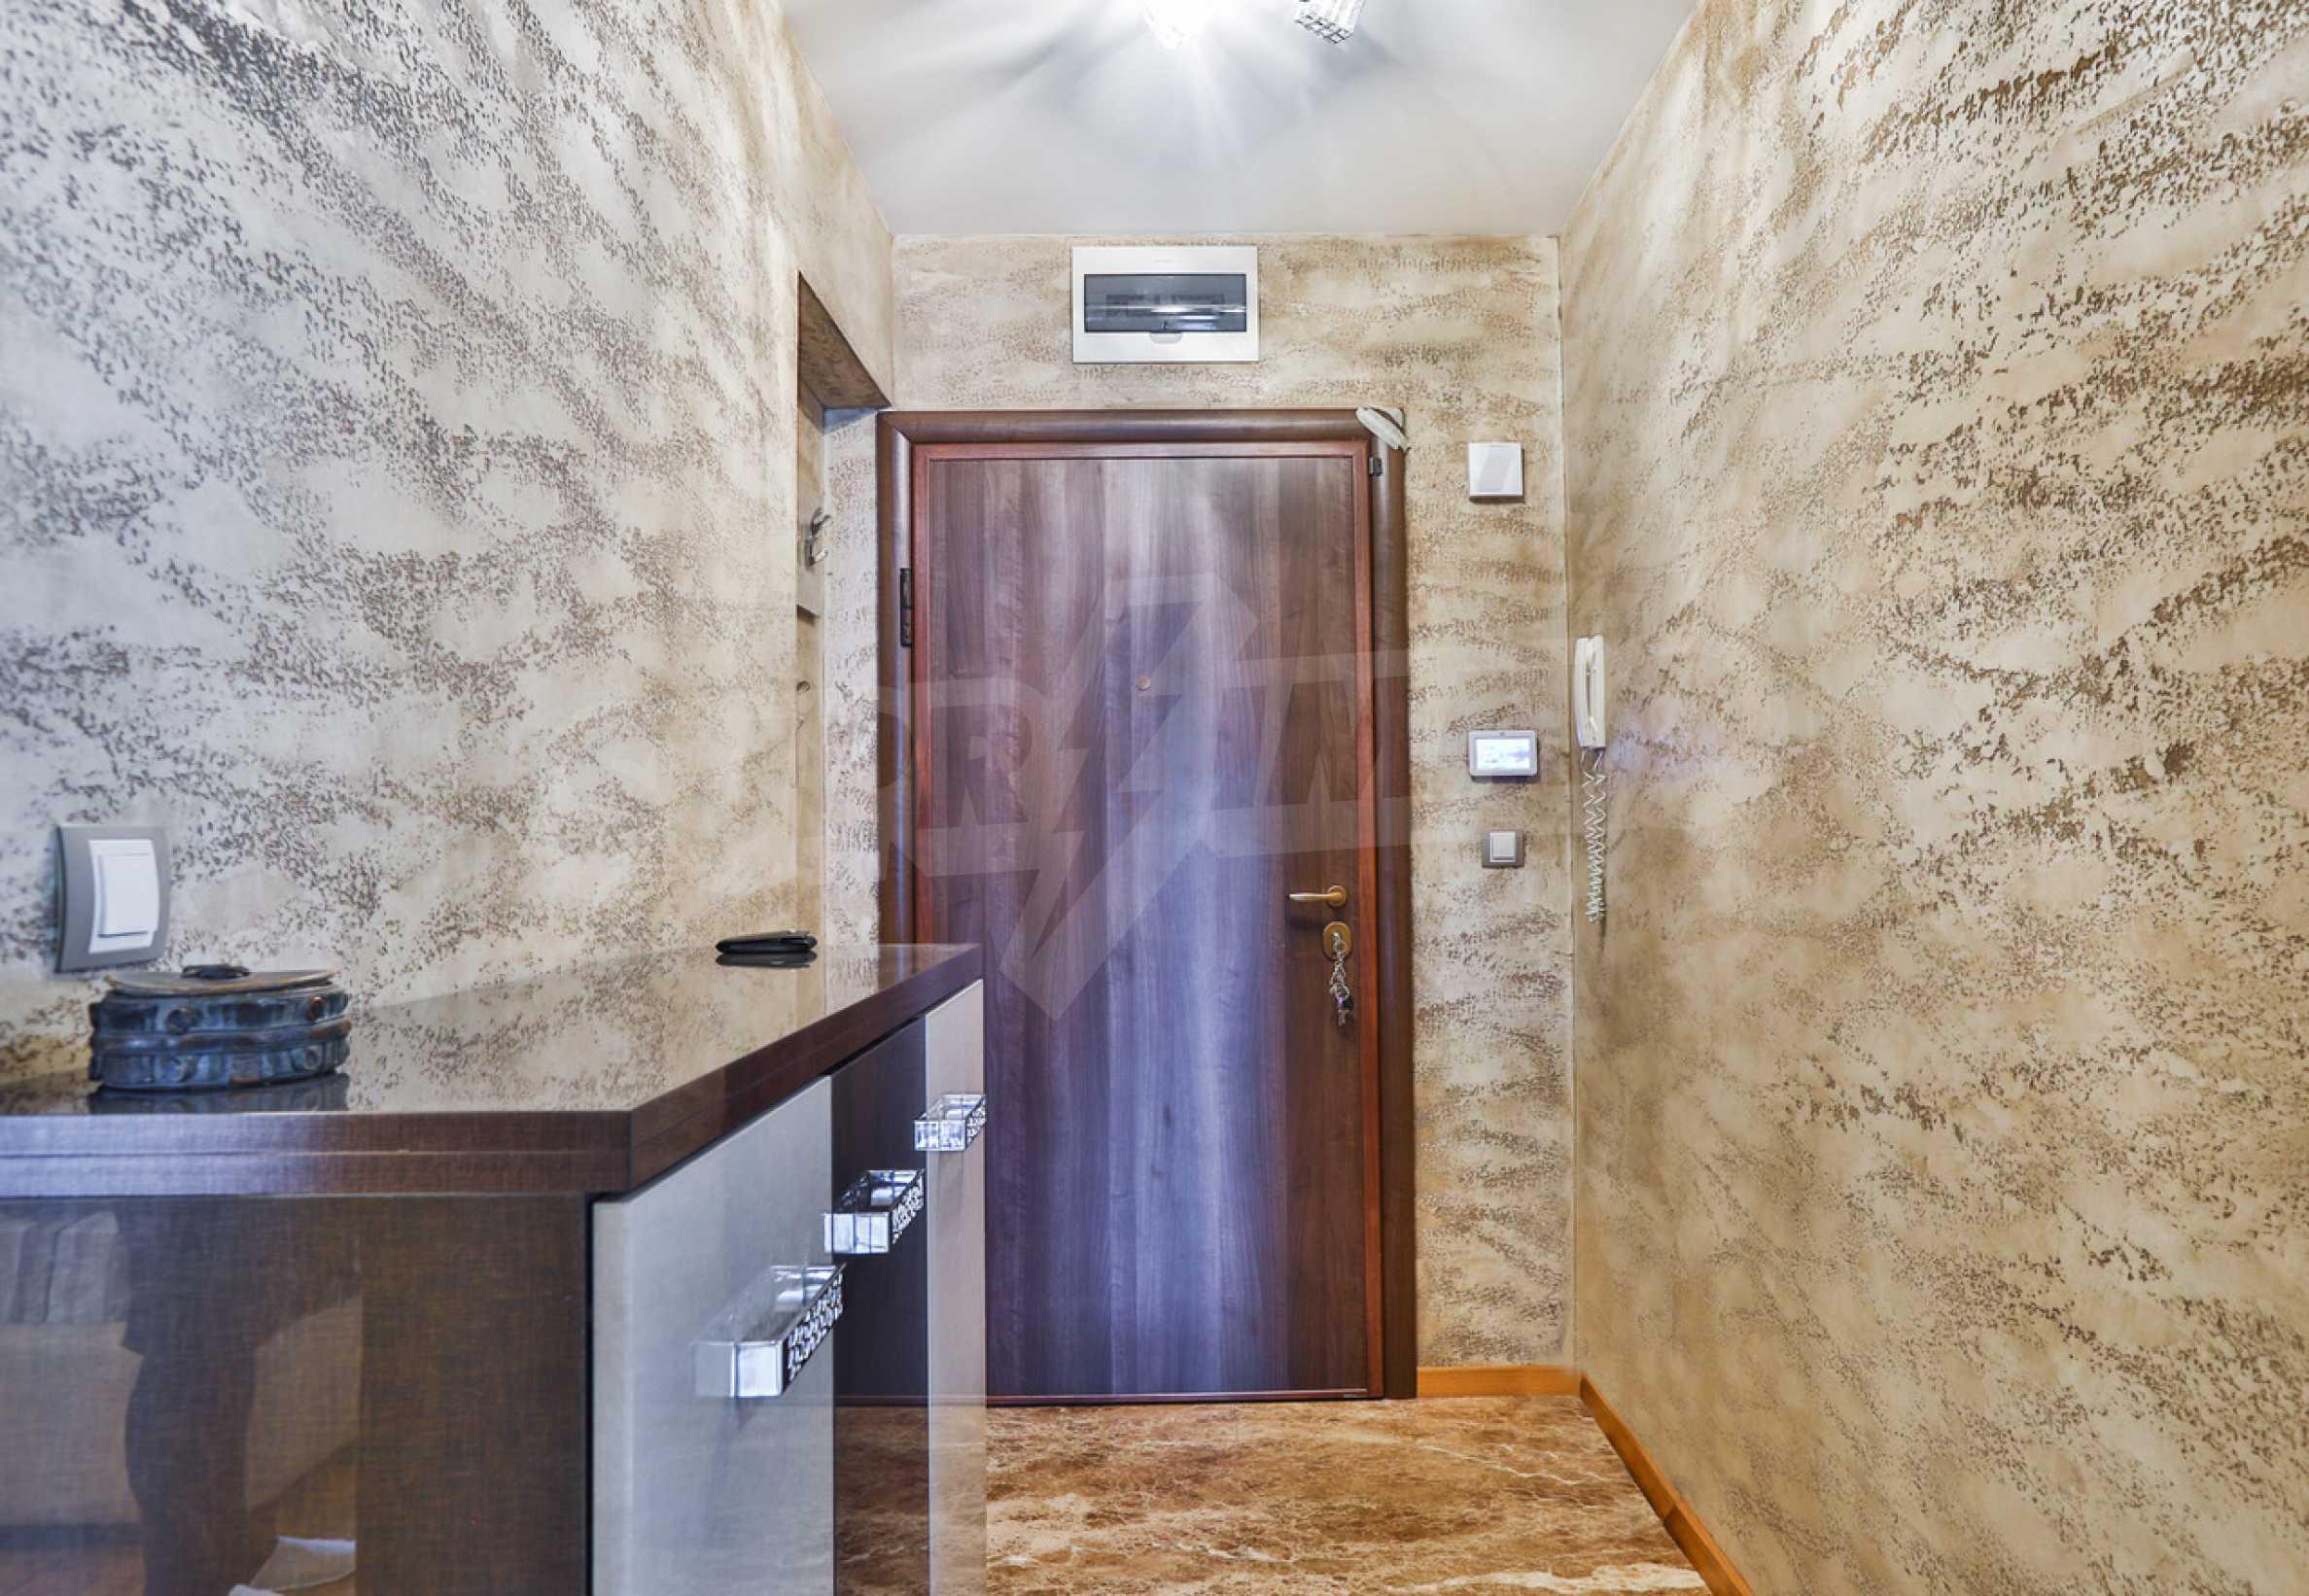 2-bedroom apartment in Sofia 15